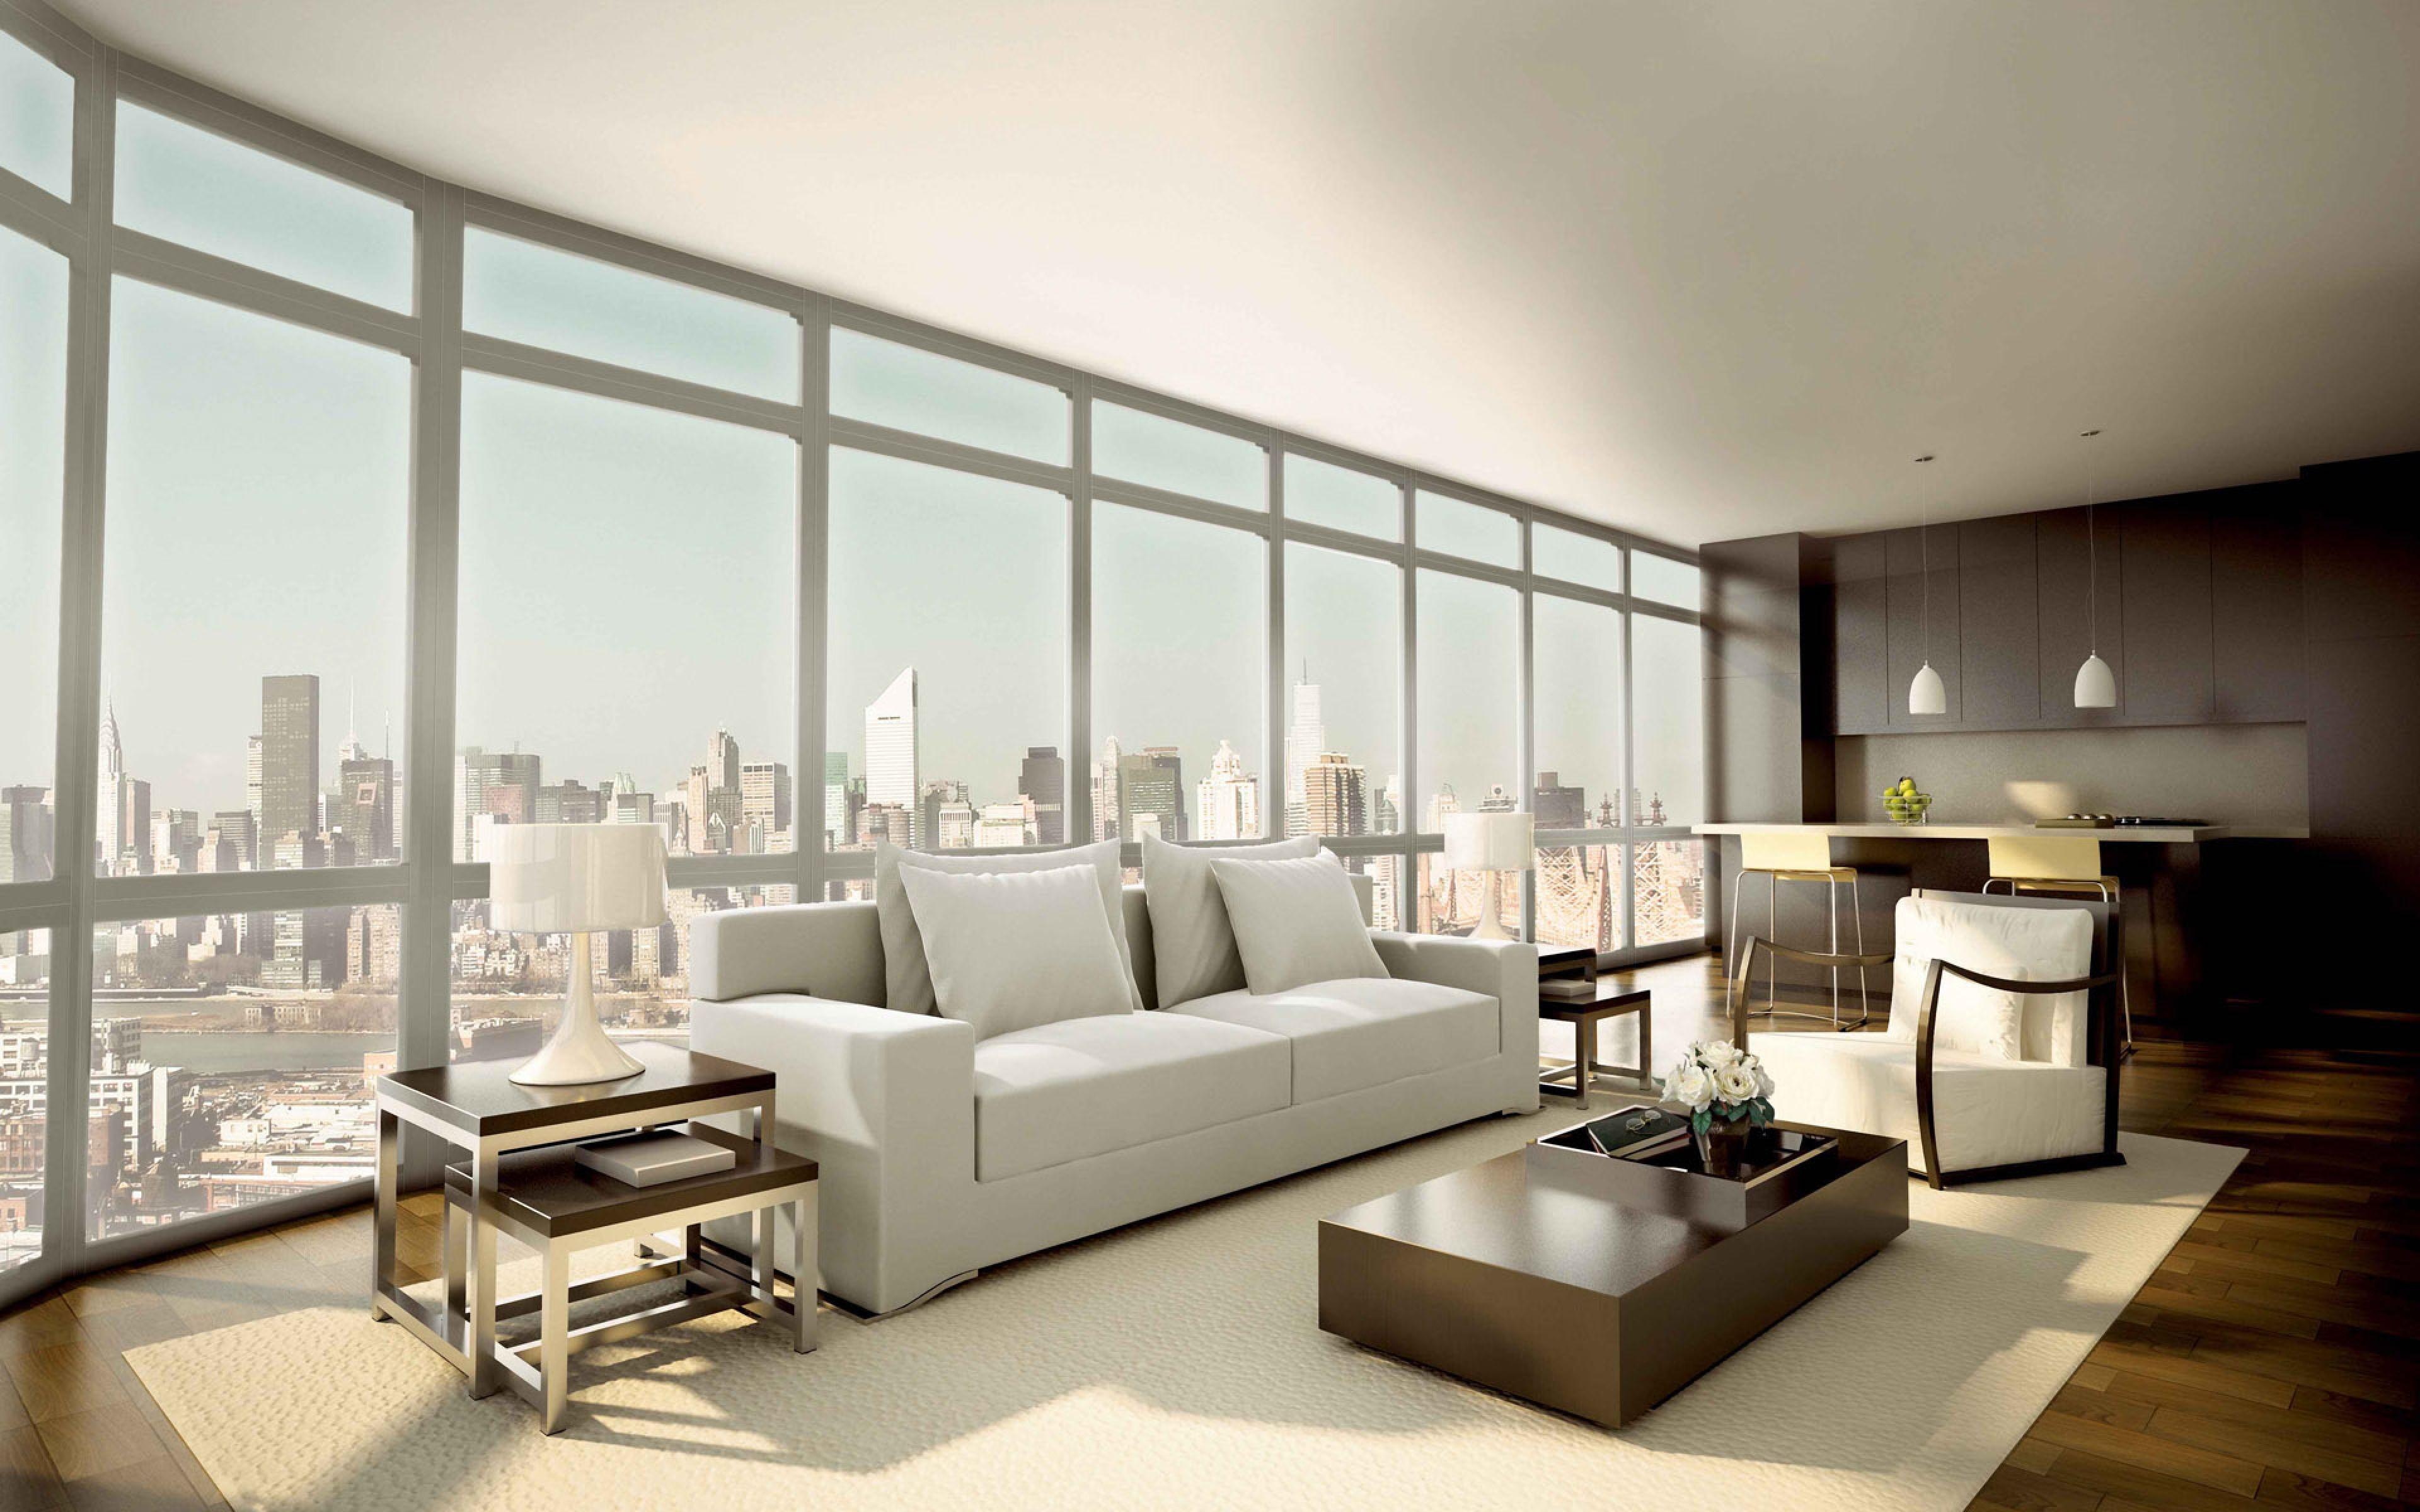 3840x2400 Wallpaper Penthouse Sofa Window Style Inte